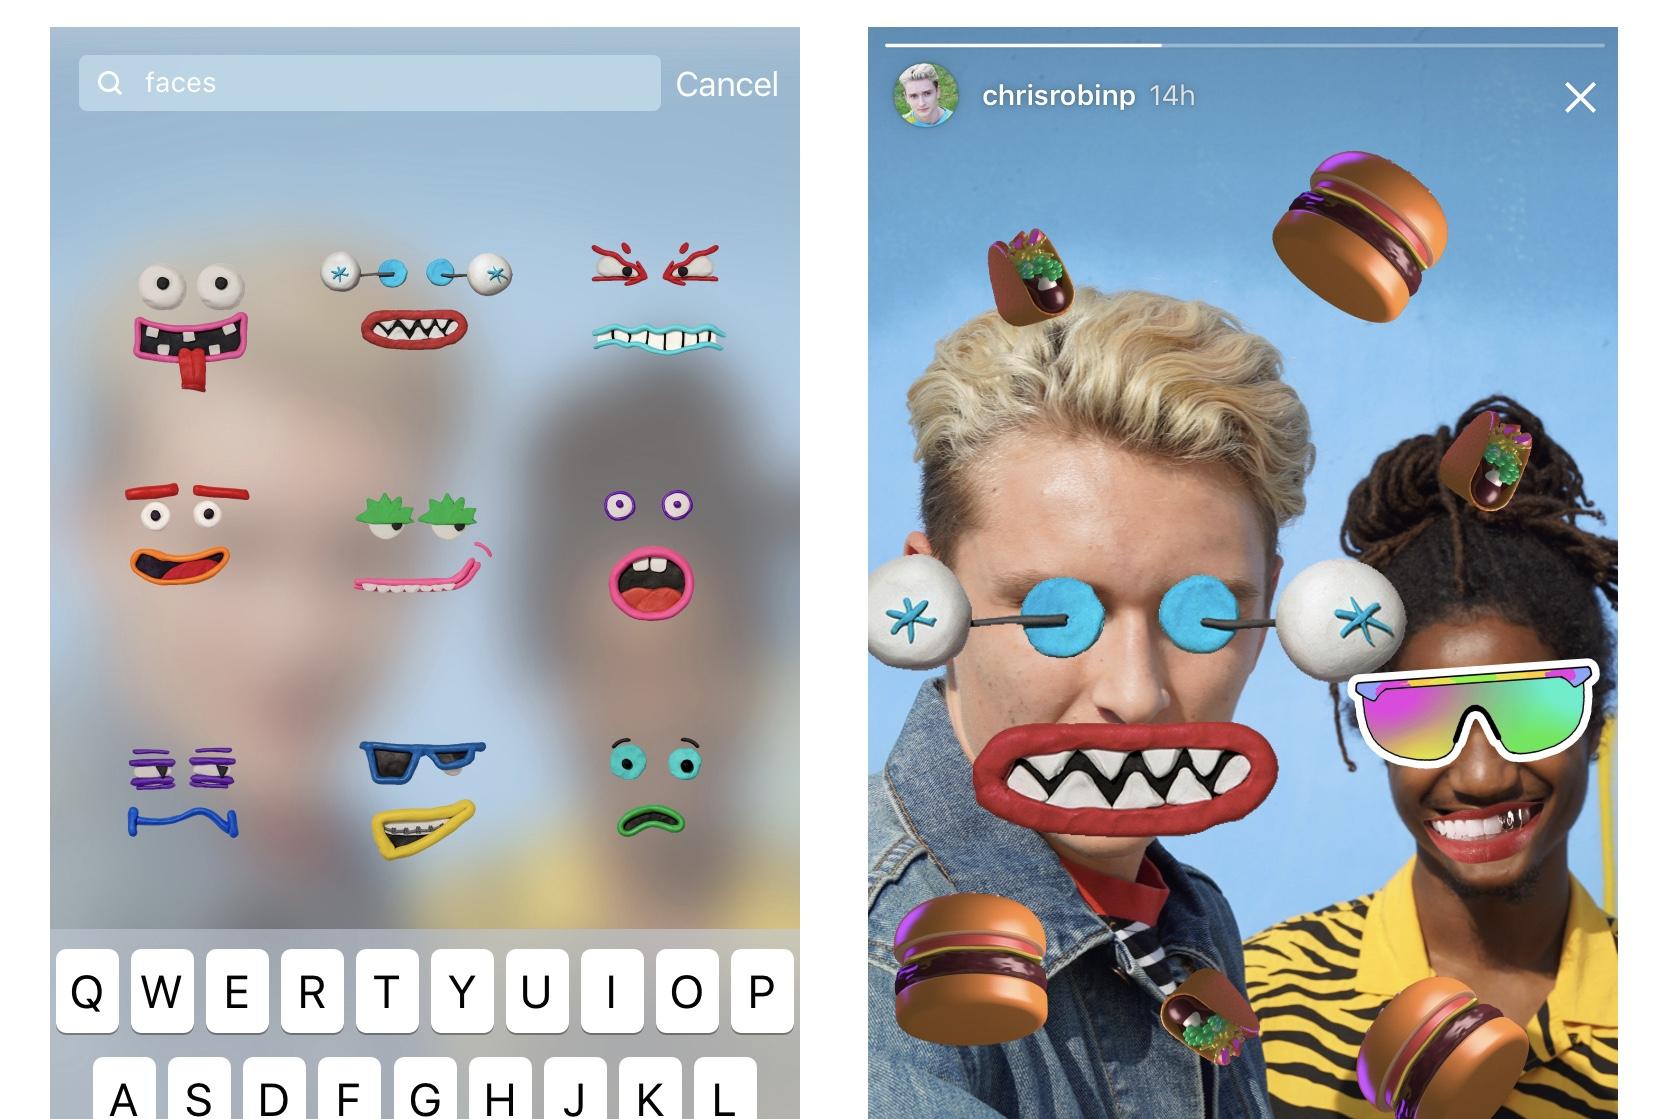 Giphy Instagram, Instagram story, Instagram GIFs, Insta Story, Stickers, GIFs, Giphy, Instagram, Updates, News, Appnations,Apps,